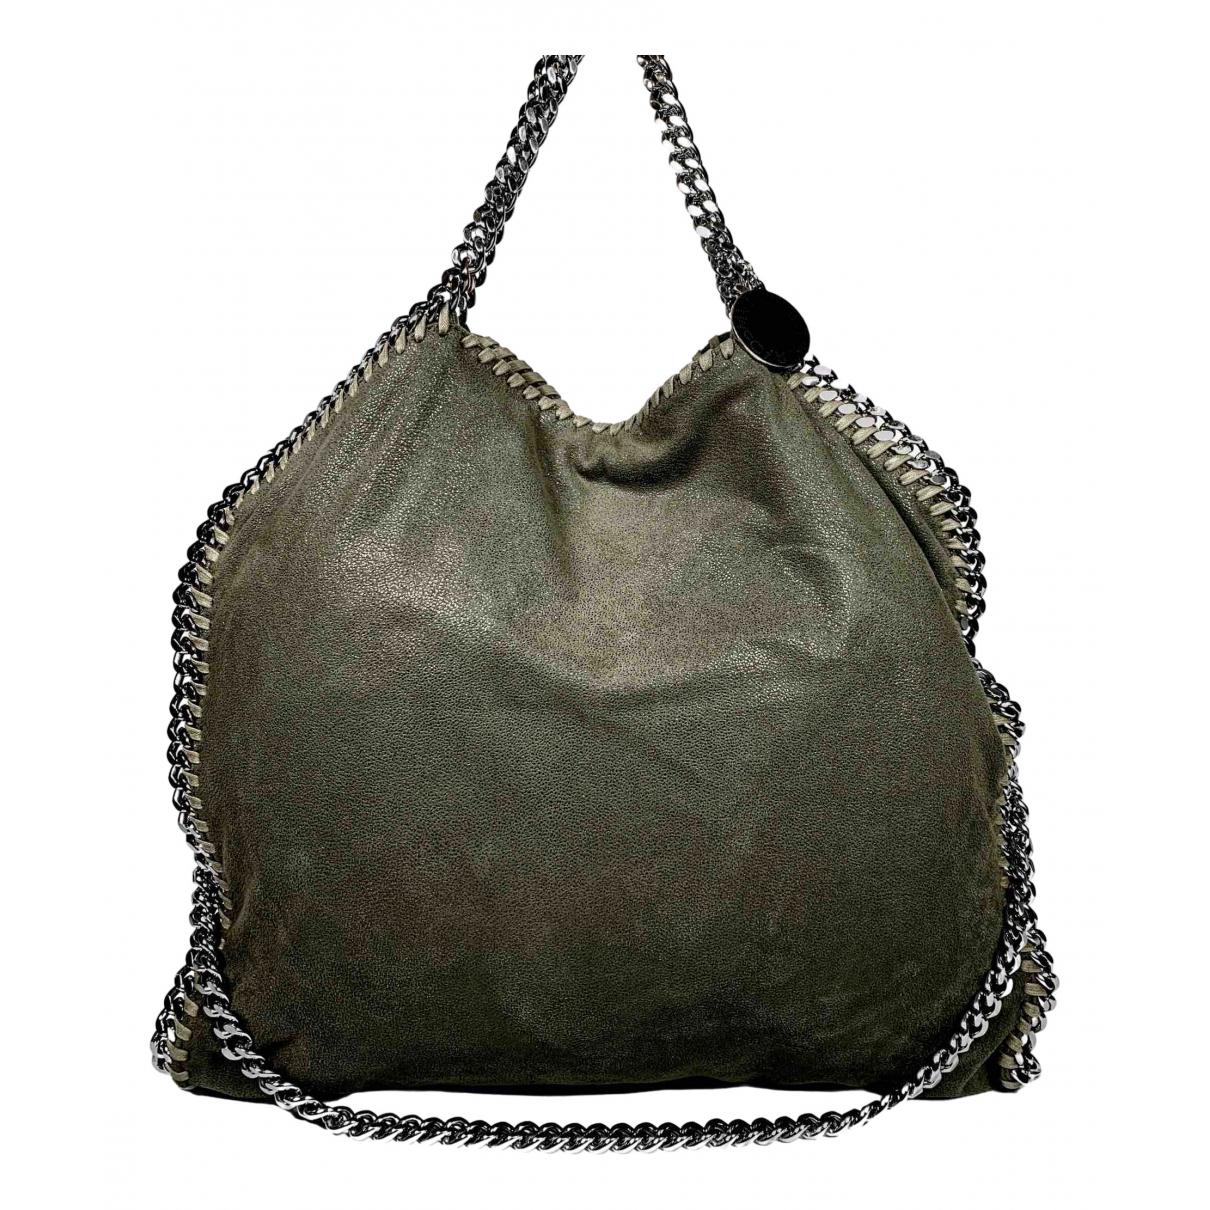 Stella Mccartney Falabella Handtasche in  Khaki Synthetik